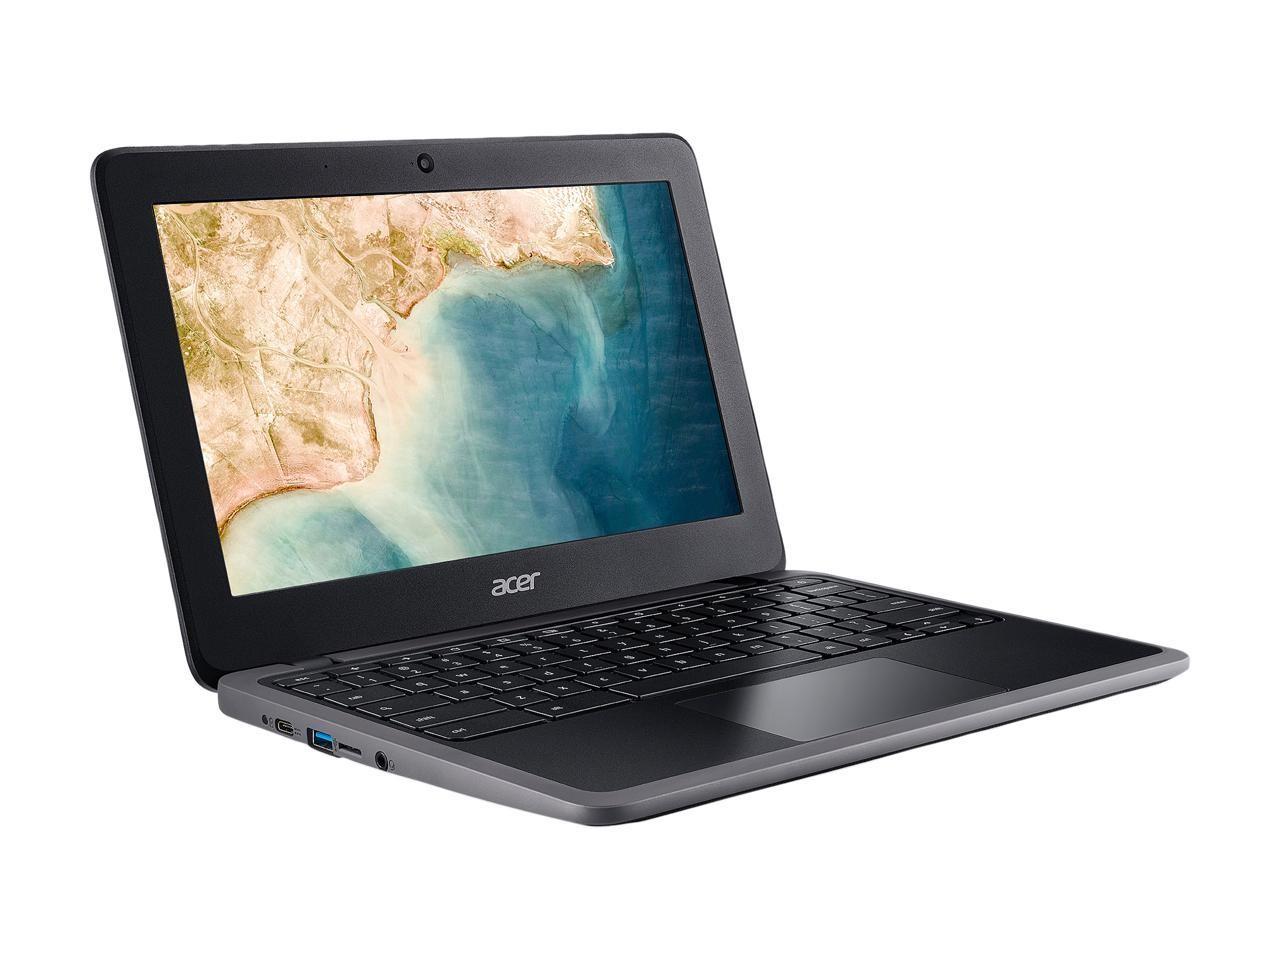 Acer C733T-C8SZ Chromebook 311 Intel Celeron N4000 1.1GHz 4GB 32GB WebCam 11.6 TouchScreen NX.H8WAA.001 Chrome OS